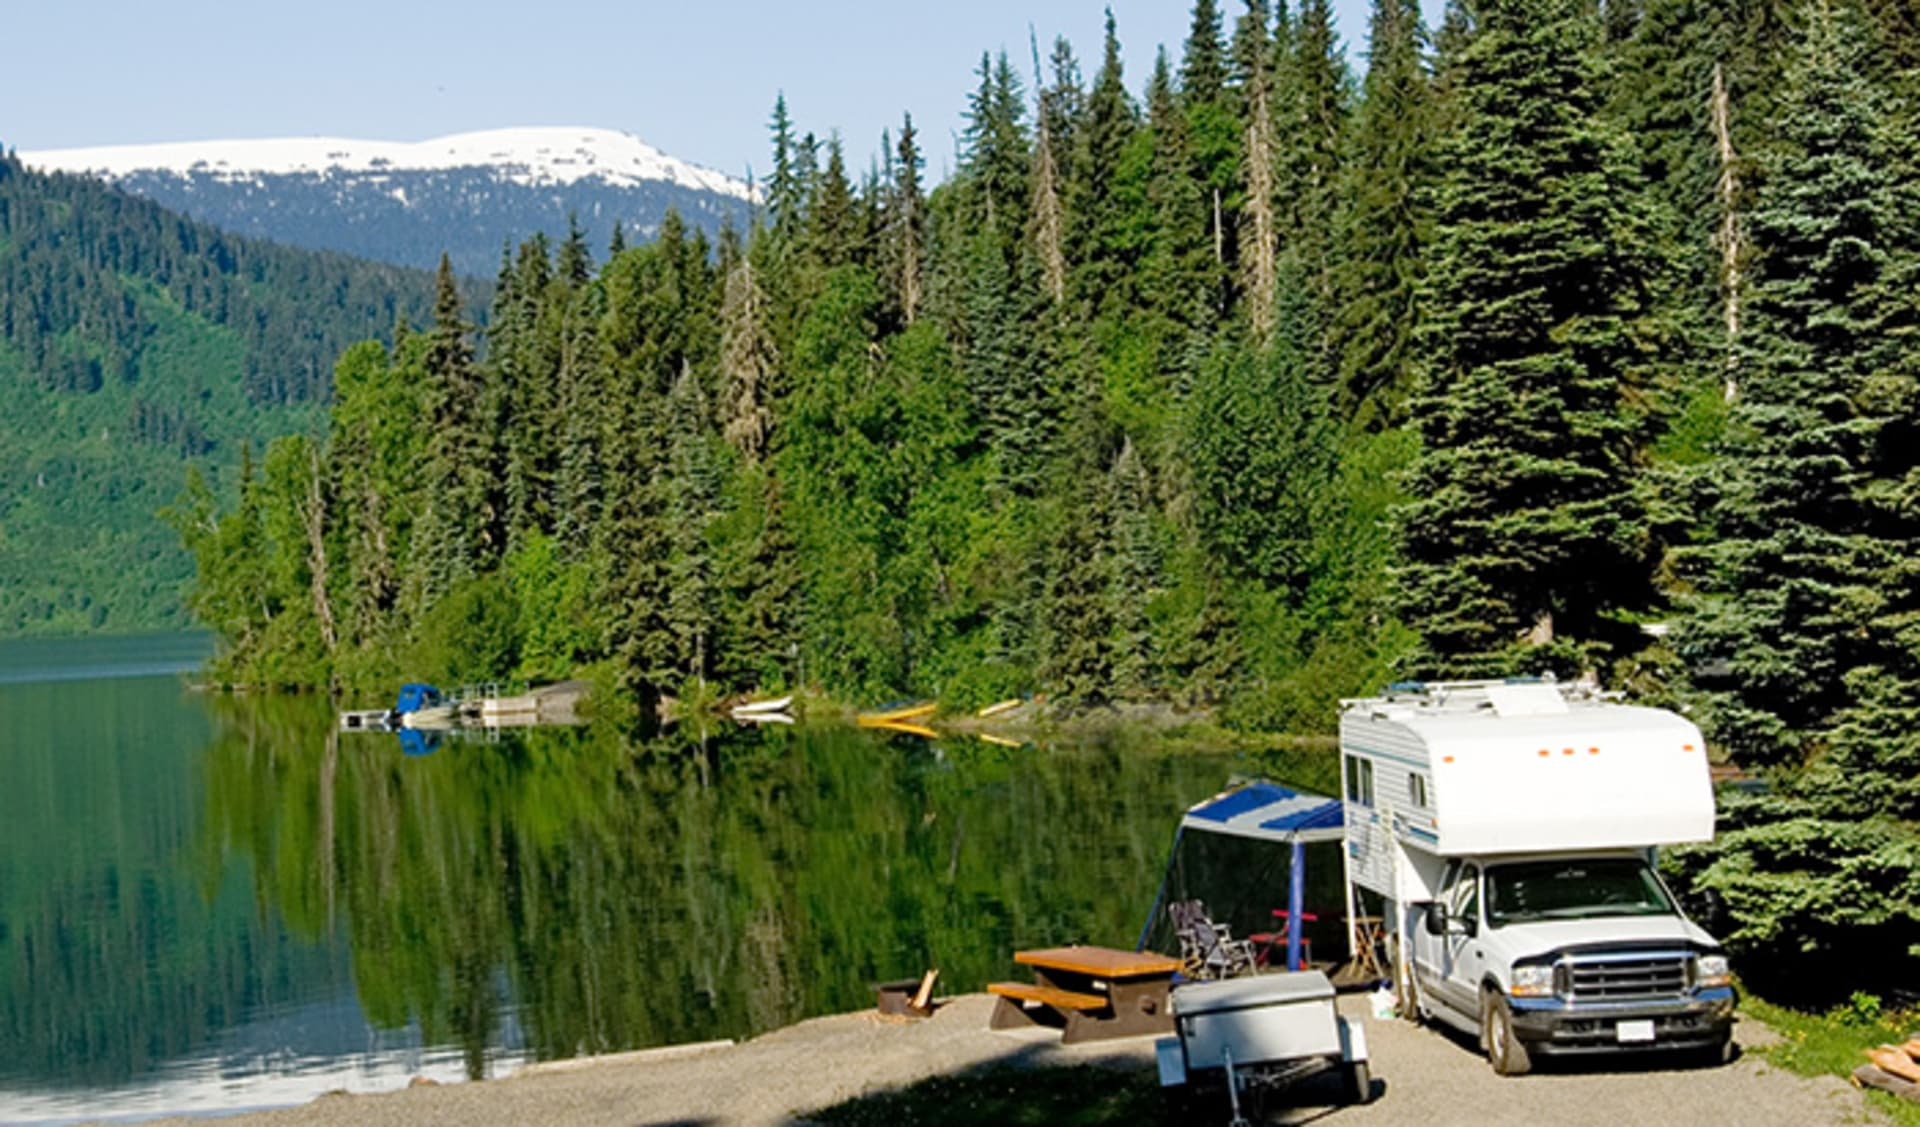 Wohnmobil, Camping, Kanada